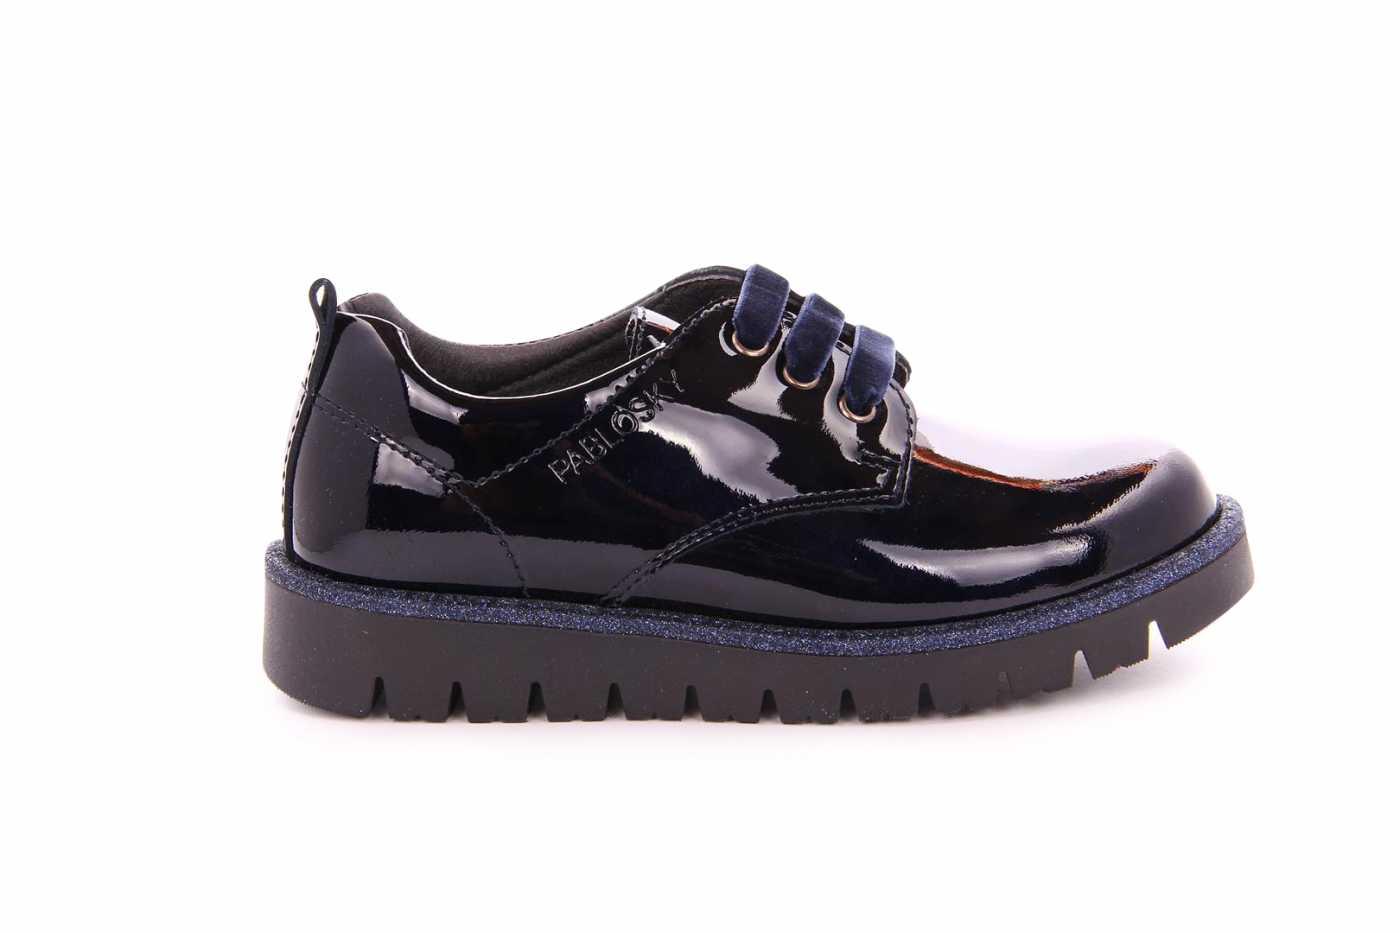 f80ec096a Comprar zapato tipo JOVEN NIÑA estilo BLUCHER COLOR AZUL CHAROL ...